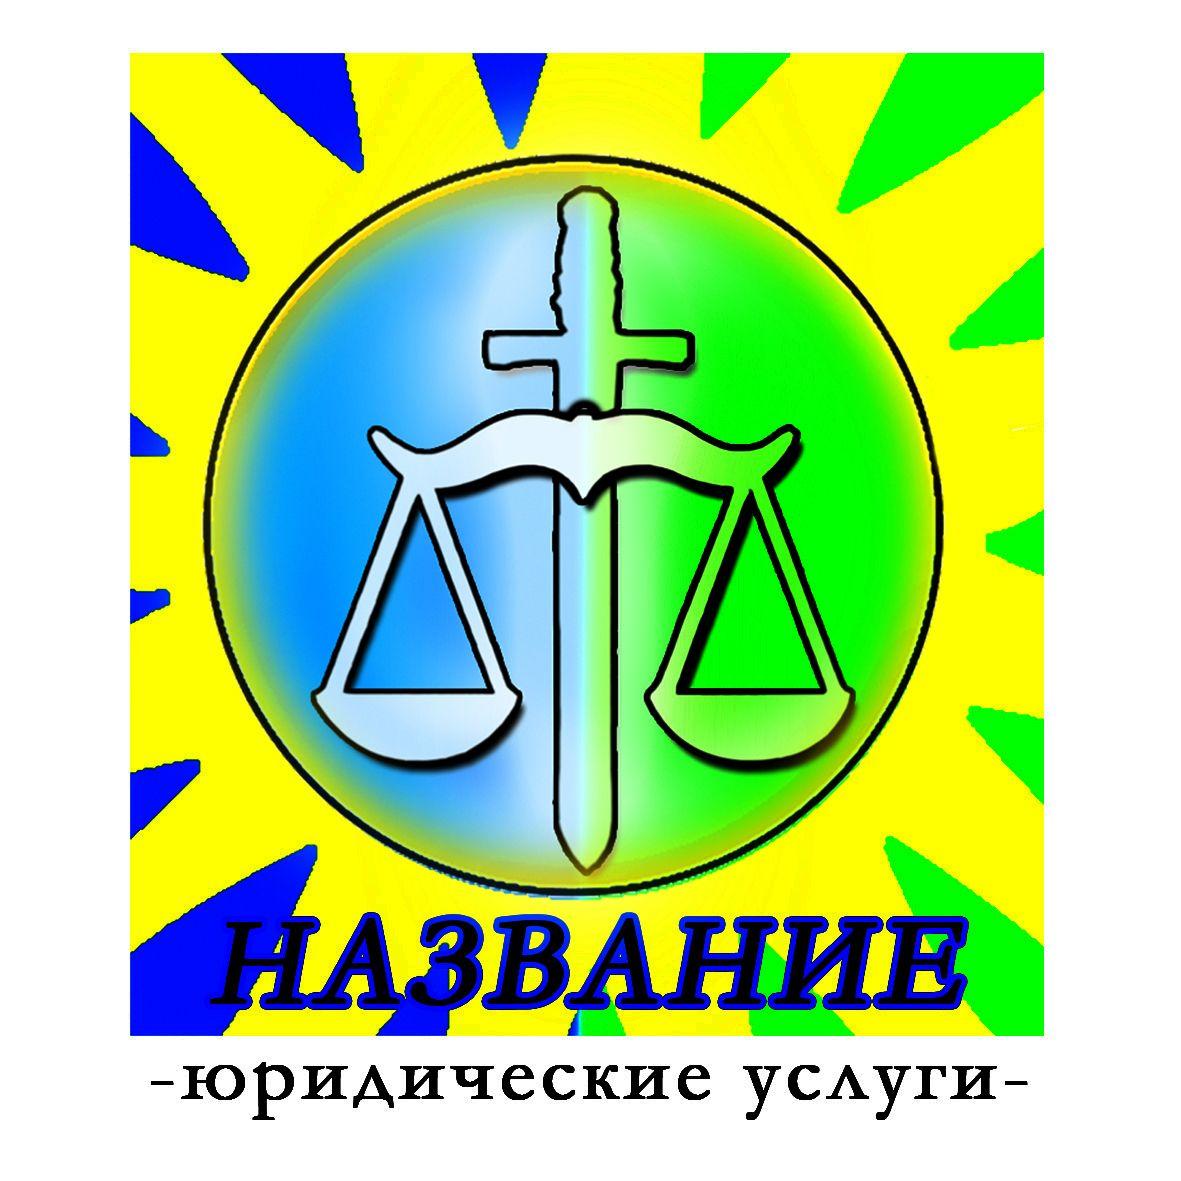 Логотип - дизайнер tata